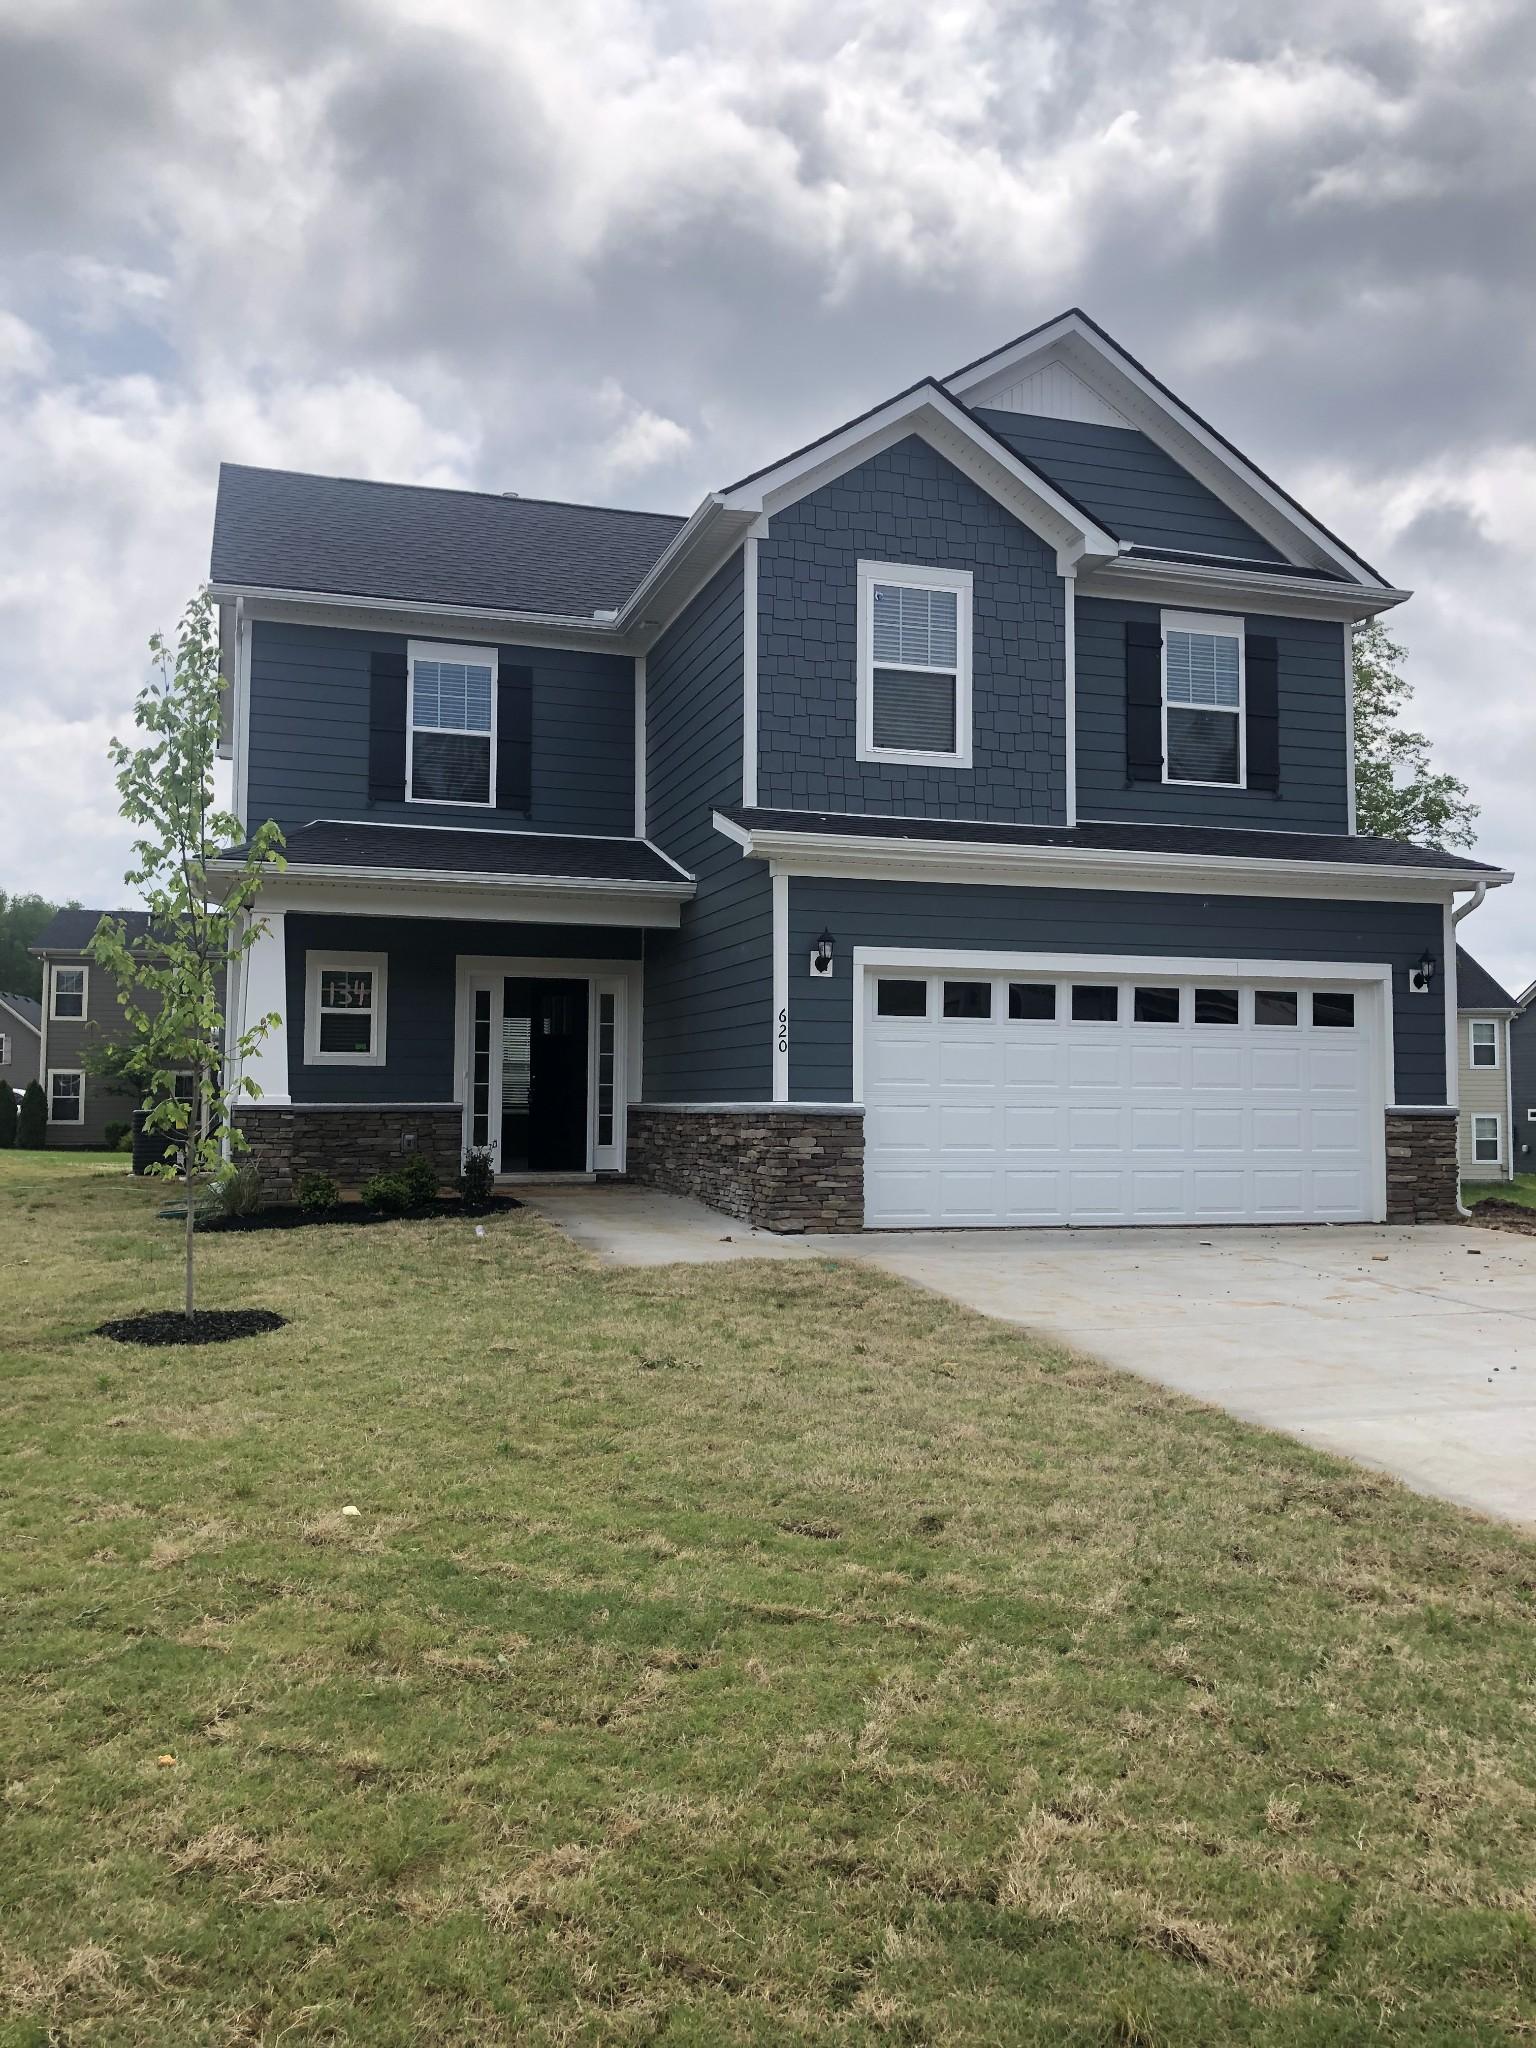 620 High Echelon Cir (Lot 134), Smyrna, TN 37167 - Smyrna, TN real estate listing